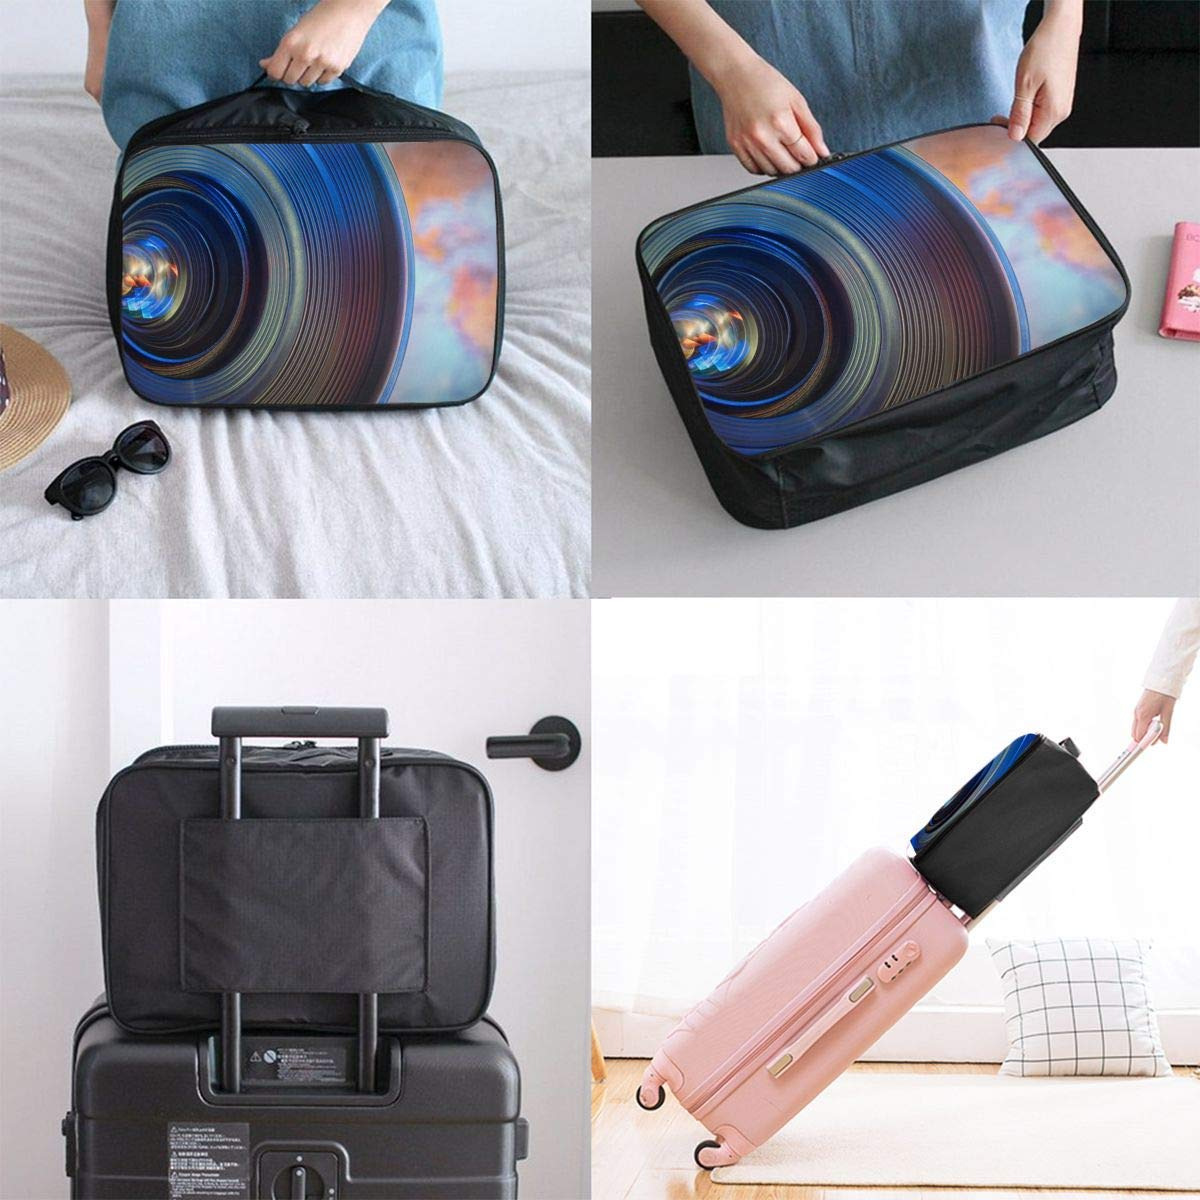 Travel Duffel Bag Backpack 2 JTRVW Luggage Bags for Travel Lightweight Large Capacity Portable Duffel Bag for Men /& Women Camera Lens